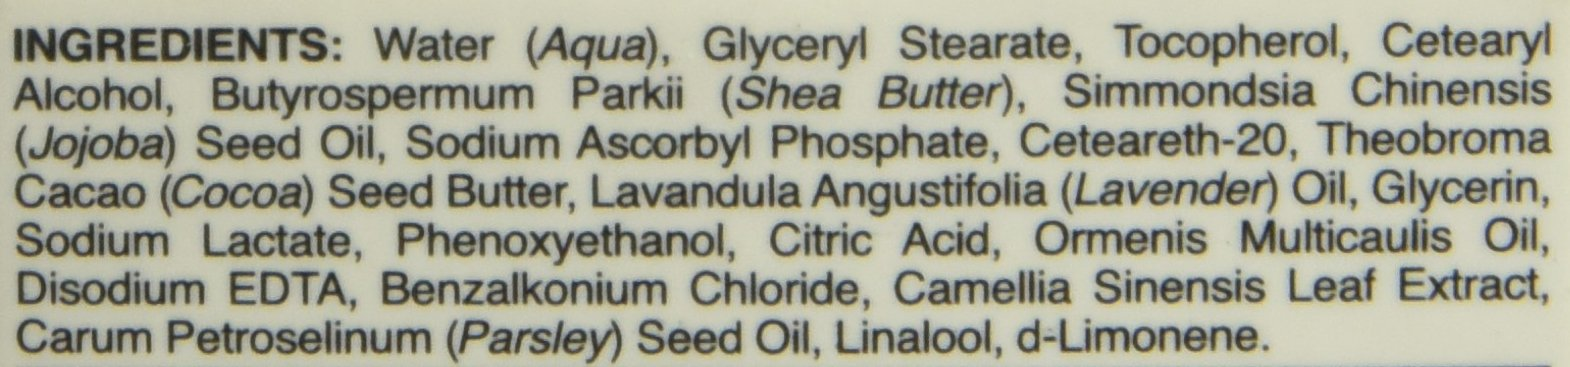 Aesop Parsley Seed Anti-Oxidant Eye Cream, 0.33 Ounce by Aesop (Image #3)